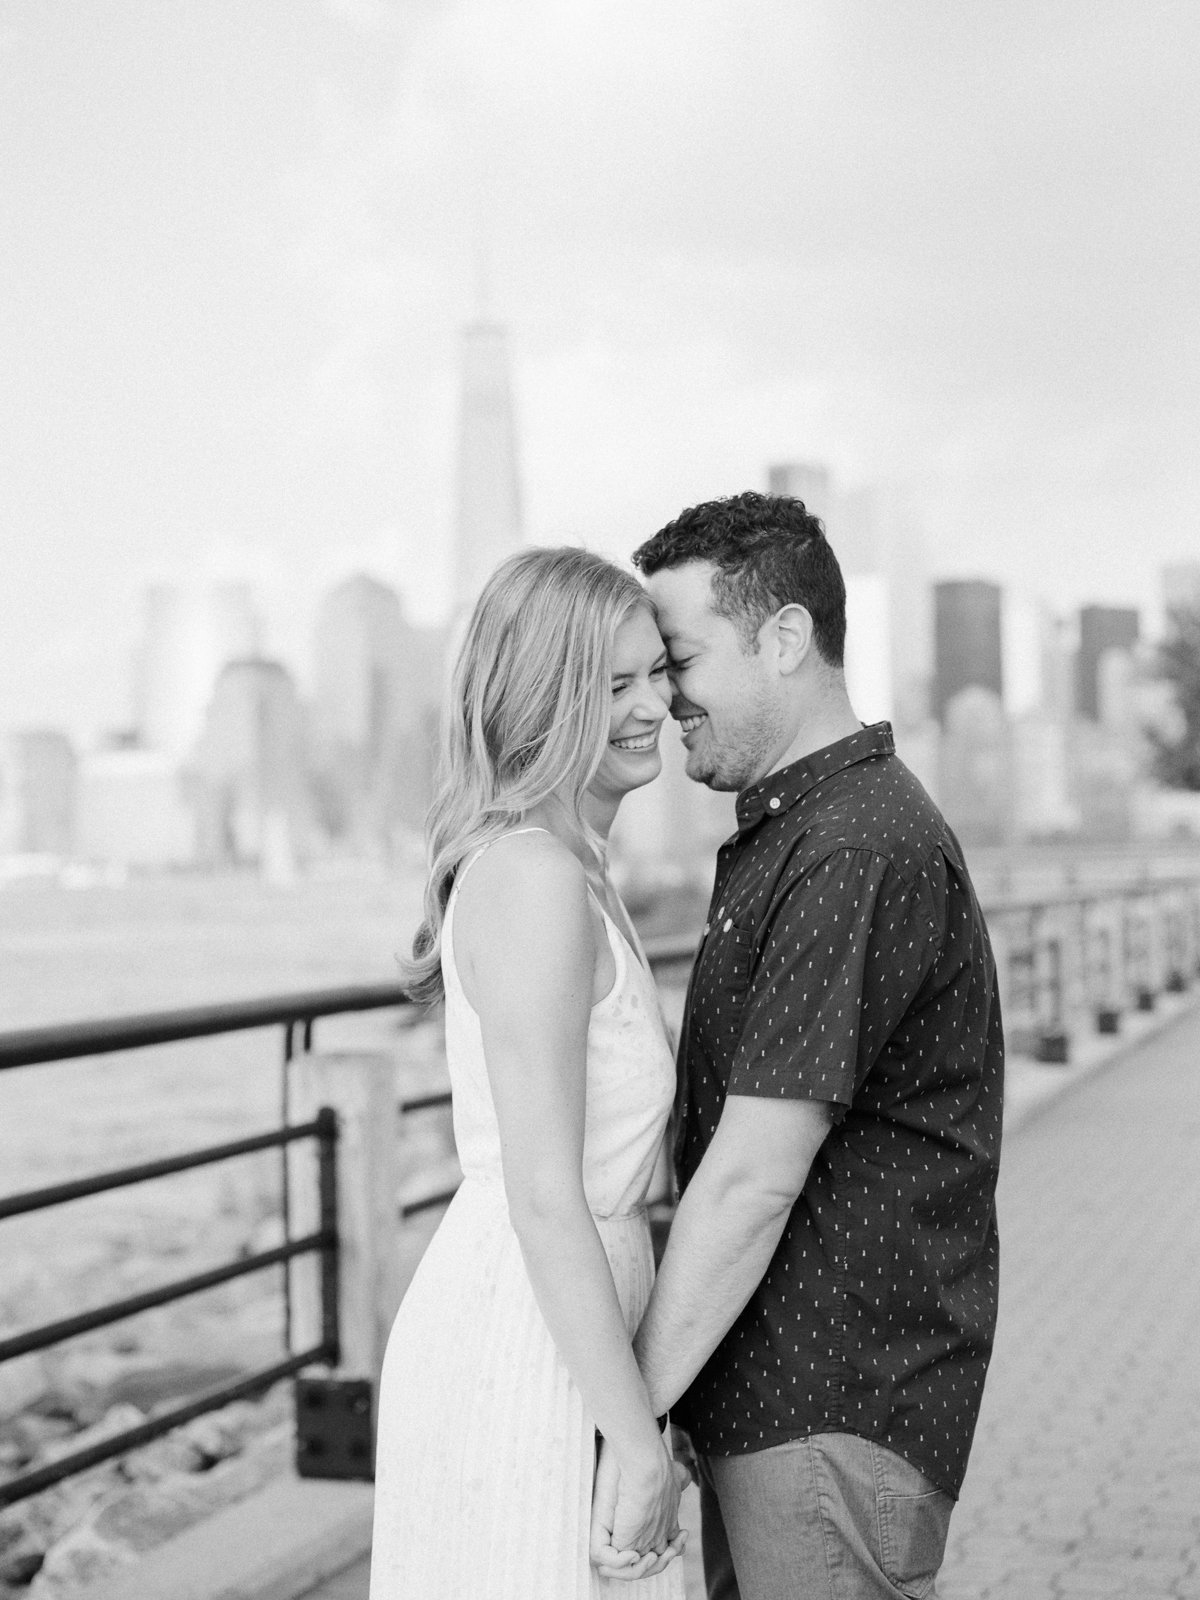 NYC-skyline-engagement-session-by-Tanya Isaeva-10.jpg